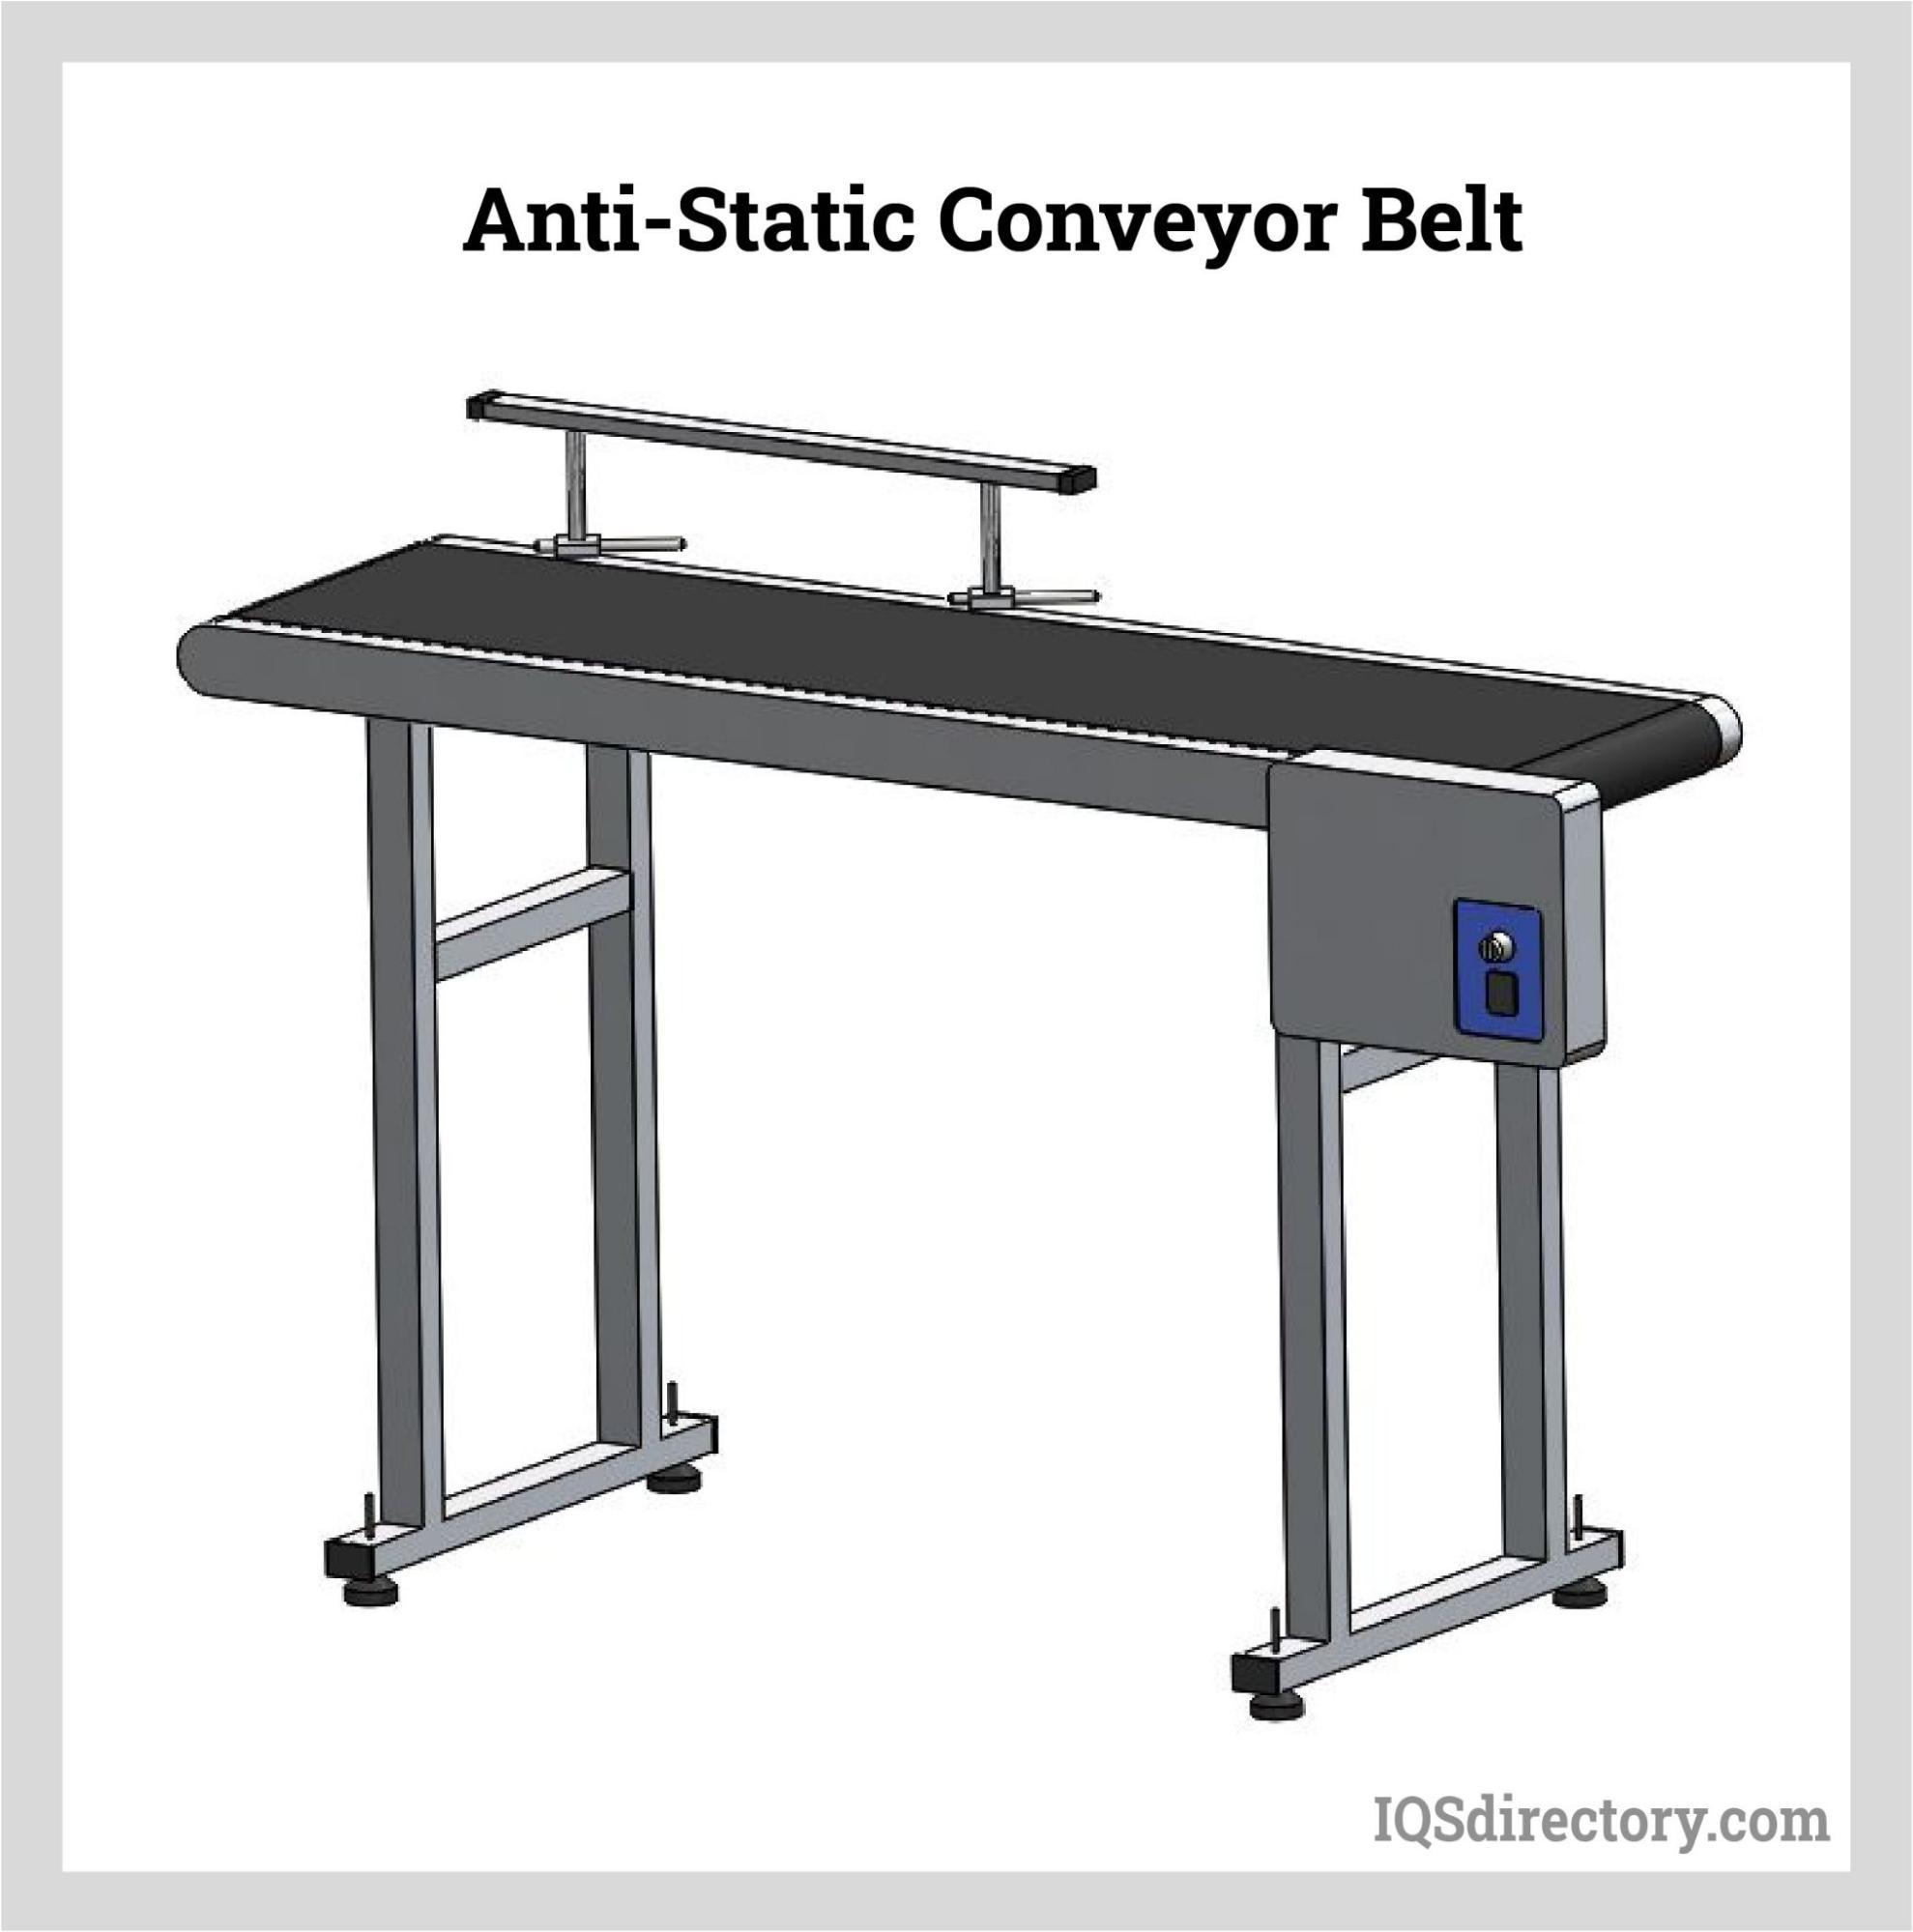 Anti-Static Conveyor Belt